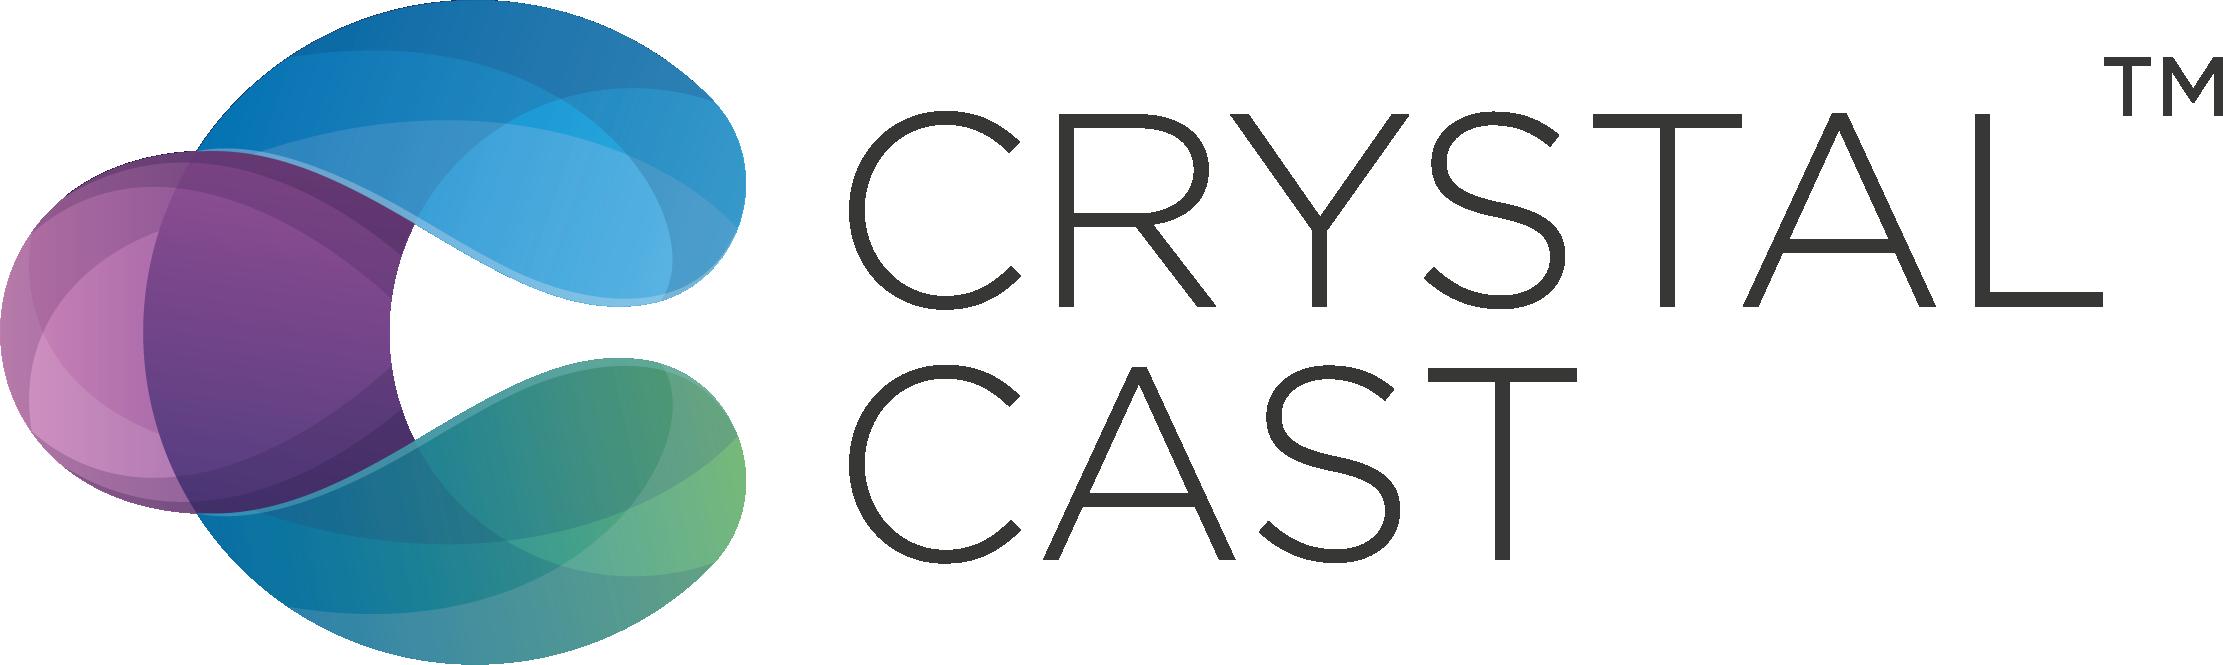 Crystal Cast Logo